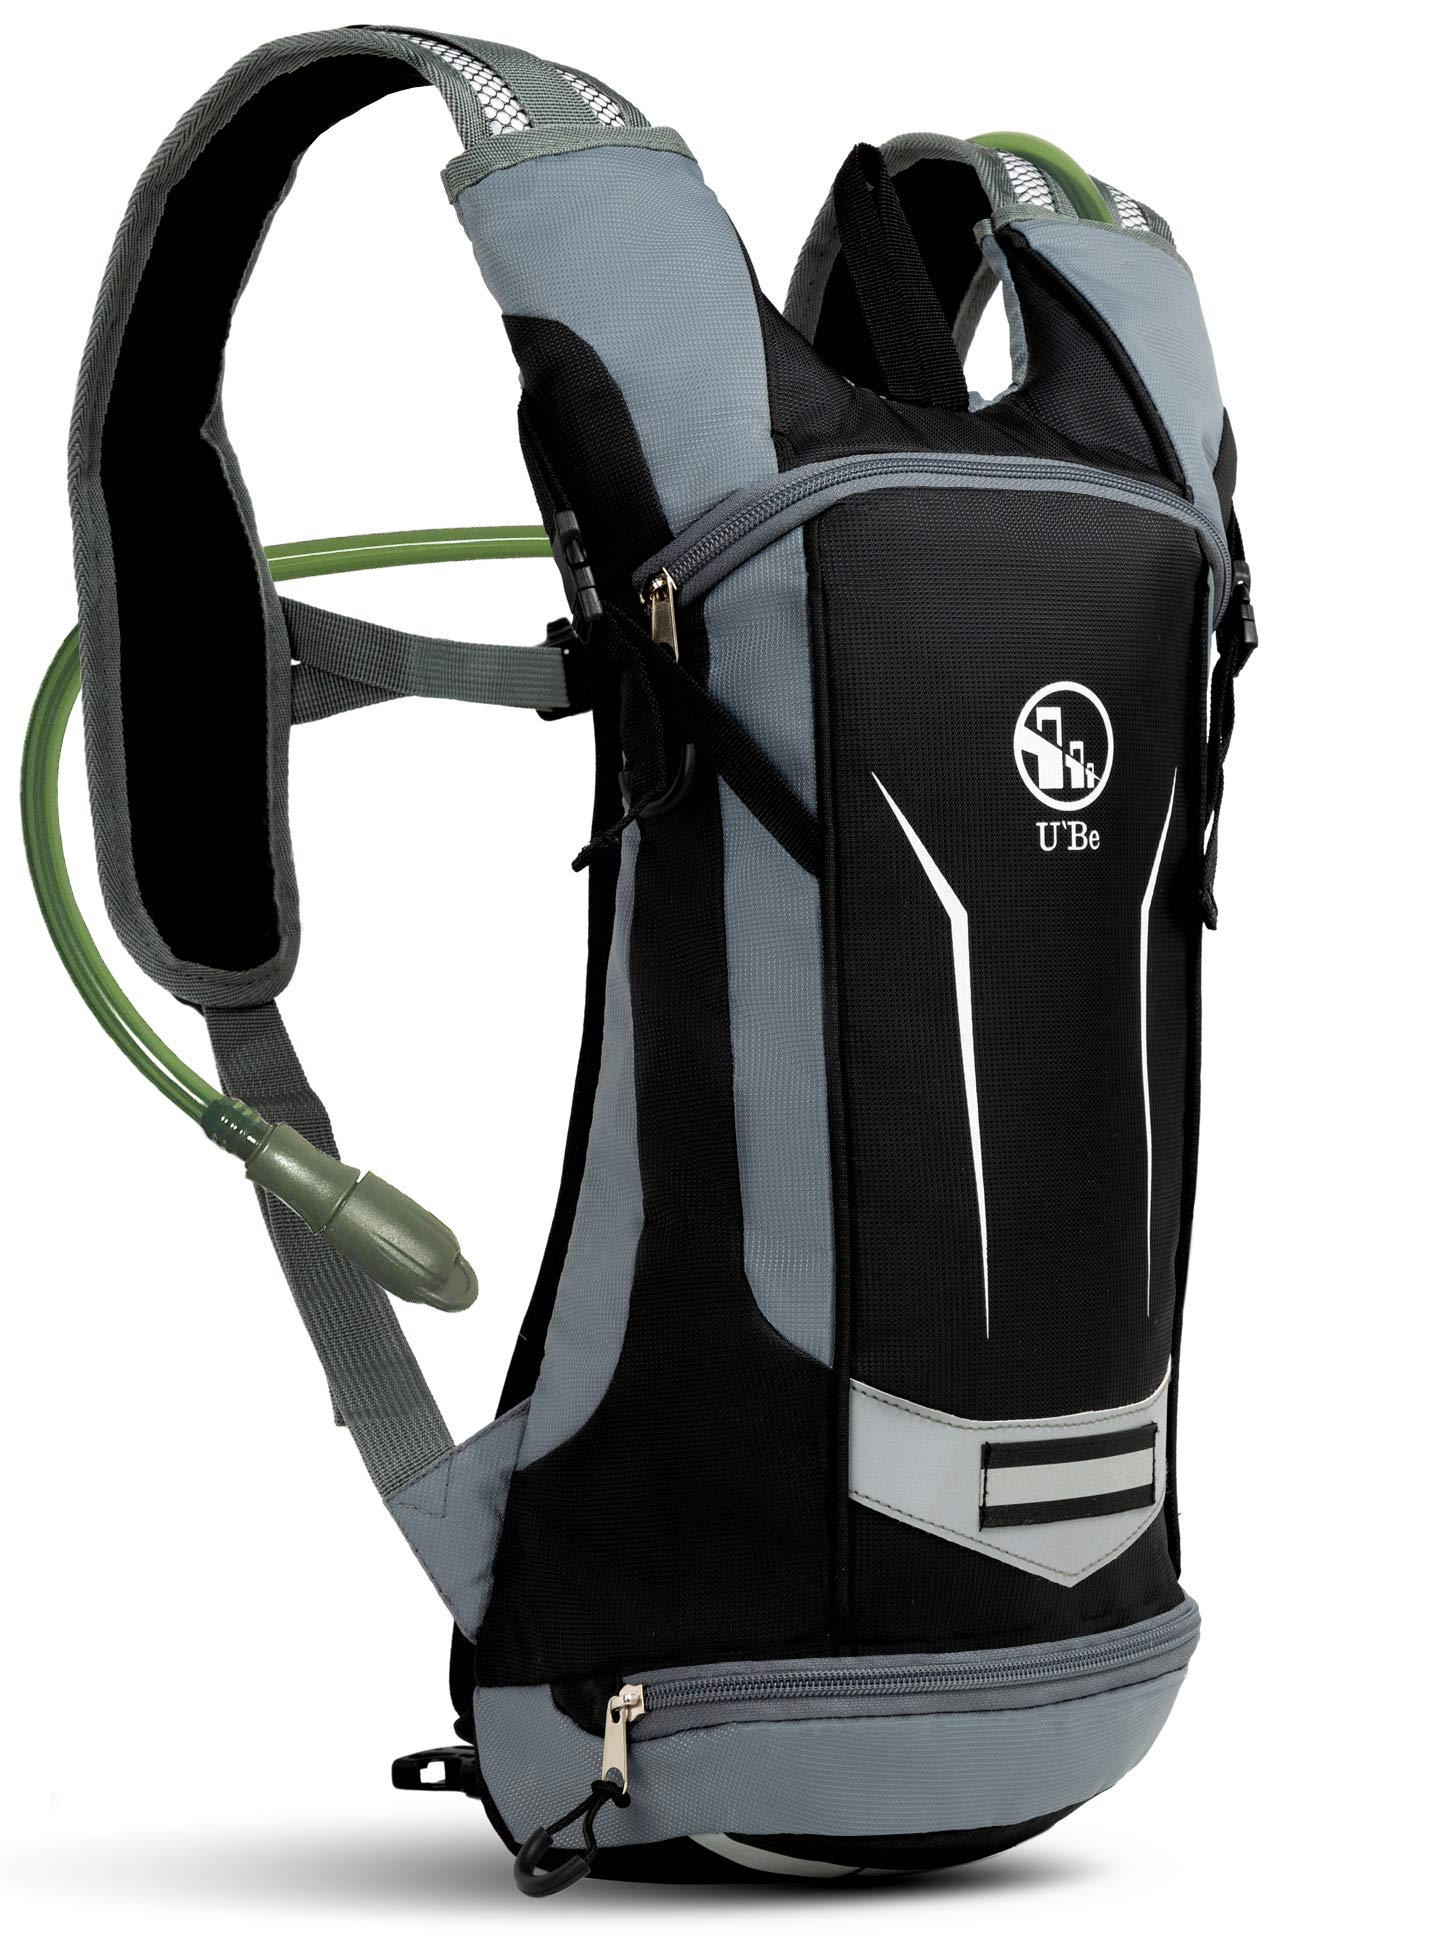 77b2242df86 U`Be Hydration Pack Water Backpack - Kids Women Men Camelback - Hiking  Biking Running Bag with 2L Bladder